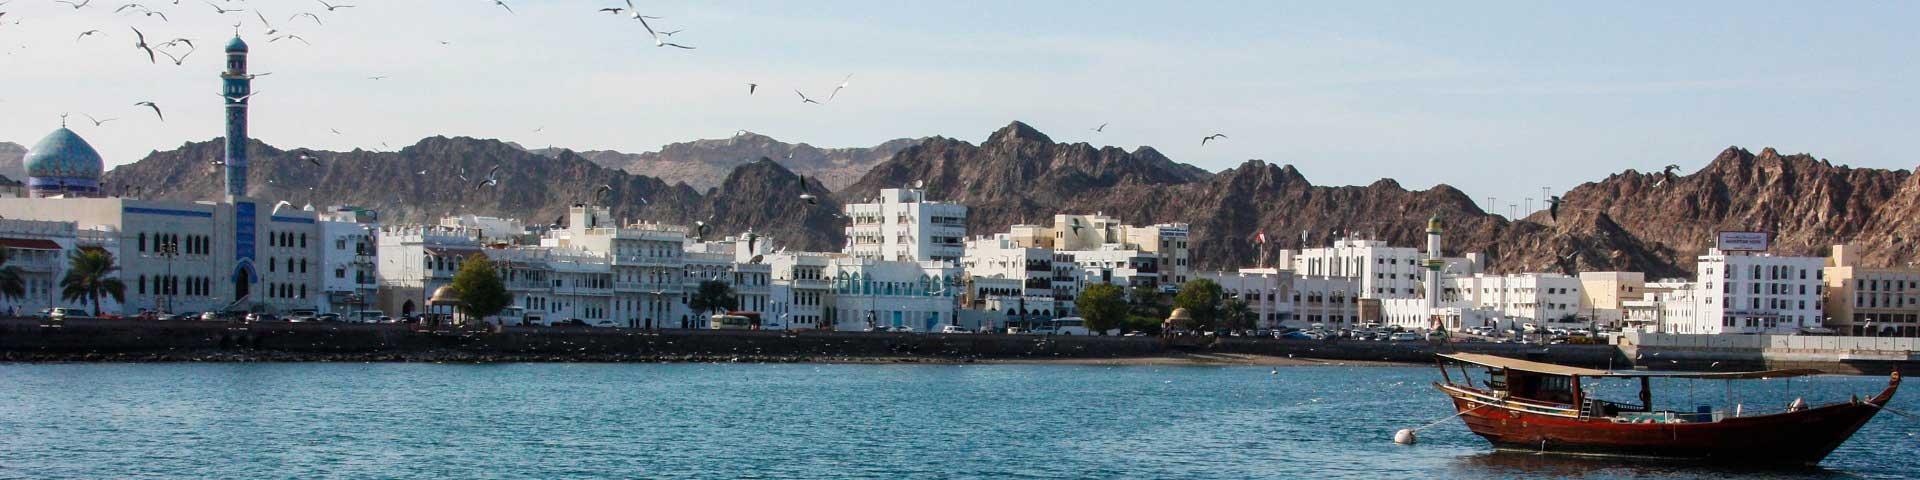 Port-Muscat